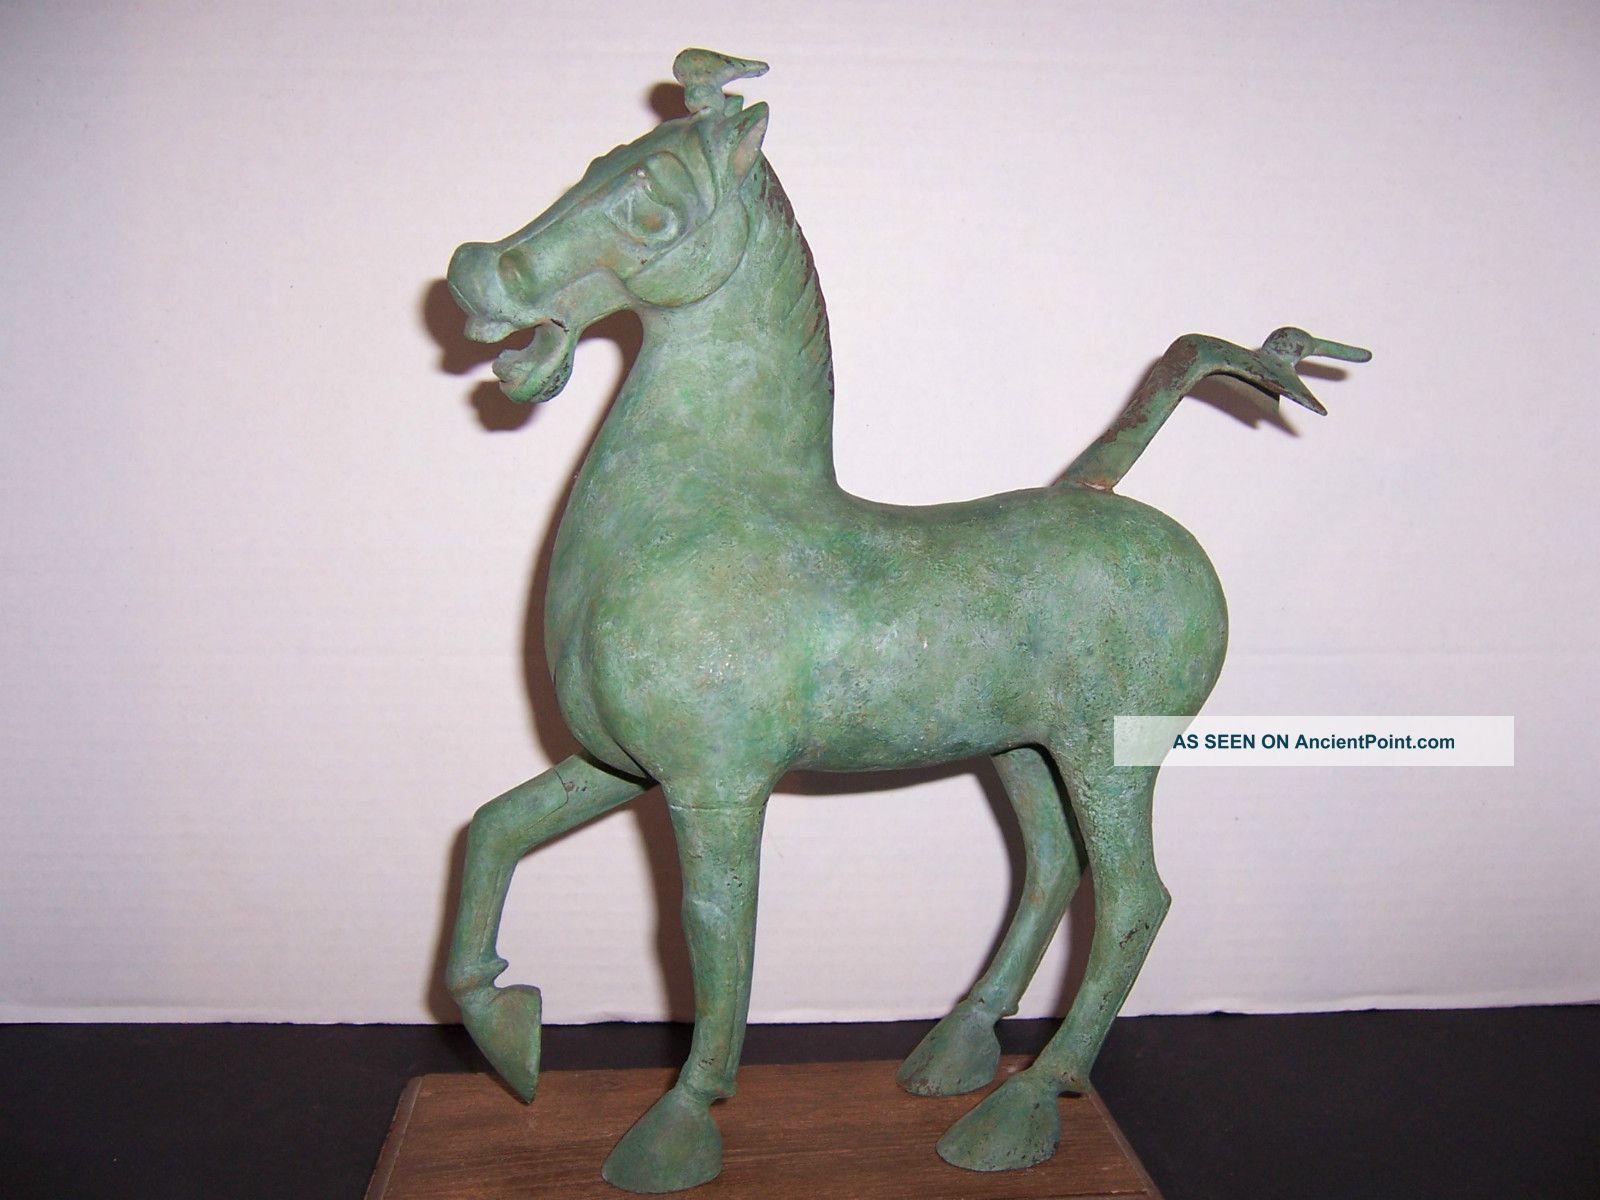 Signed Bronze 1977 Celestial Horse Of Kansu Gansu Alva Museum Replica Ltd Edn. Reproductions photo